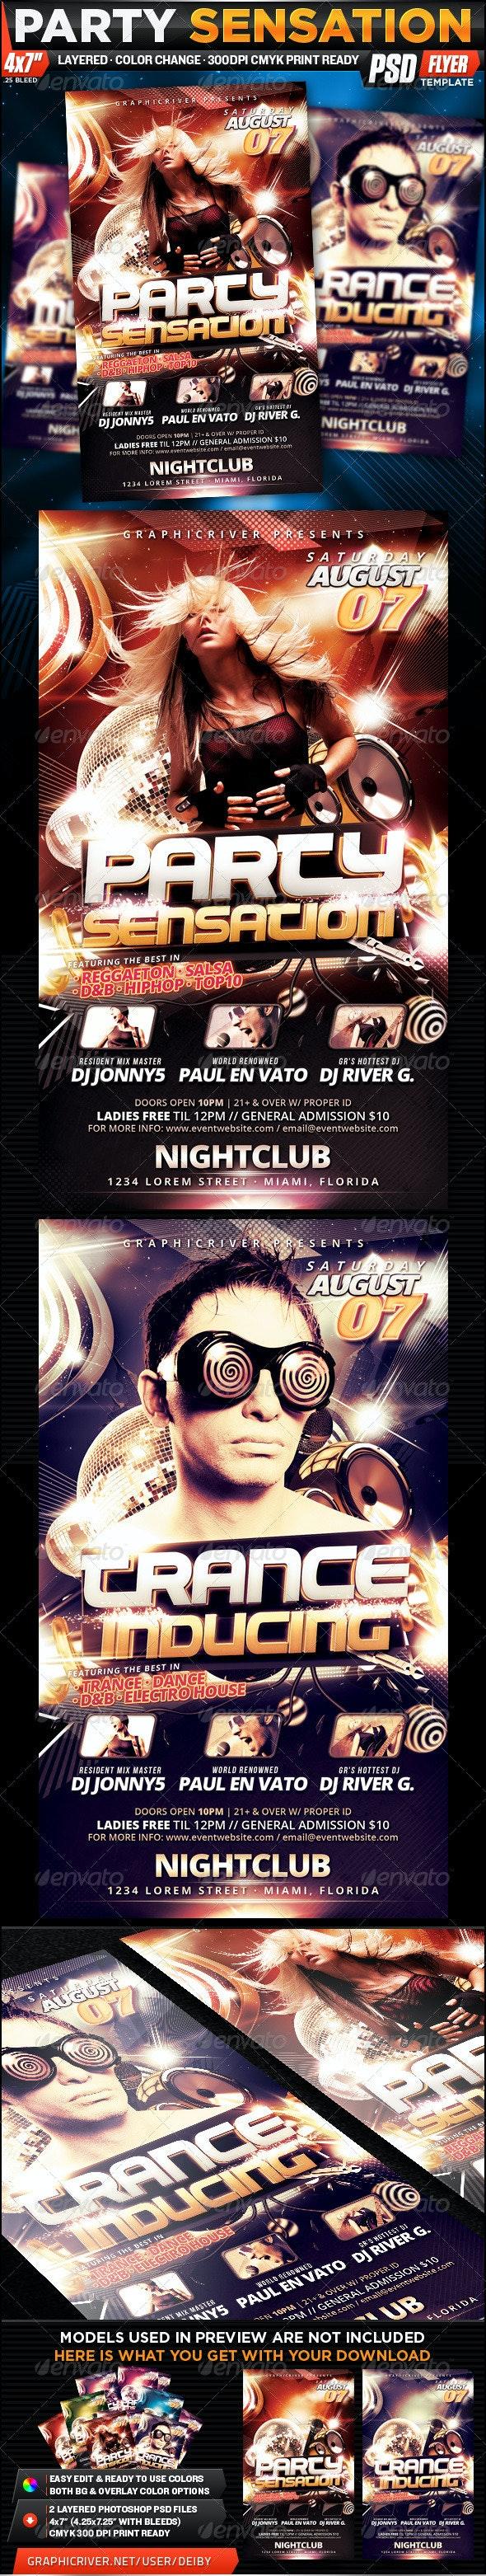 Party Sensation Flyer Template - Clubs & Parties Events